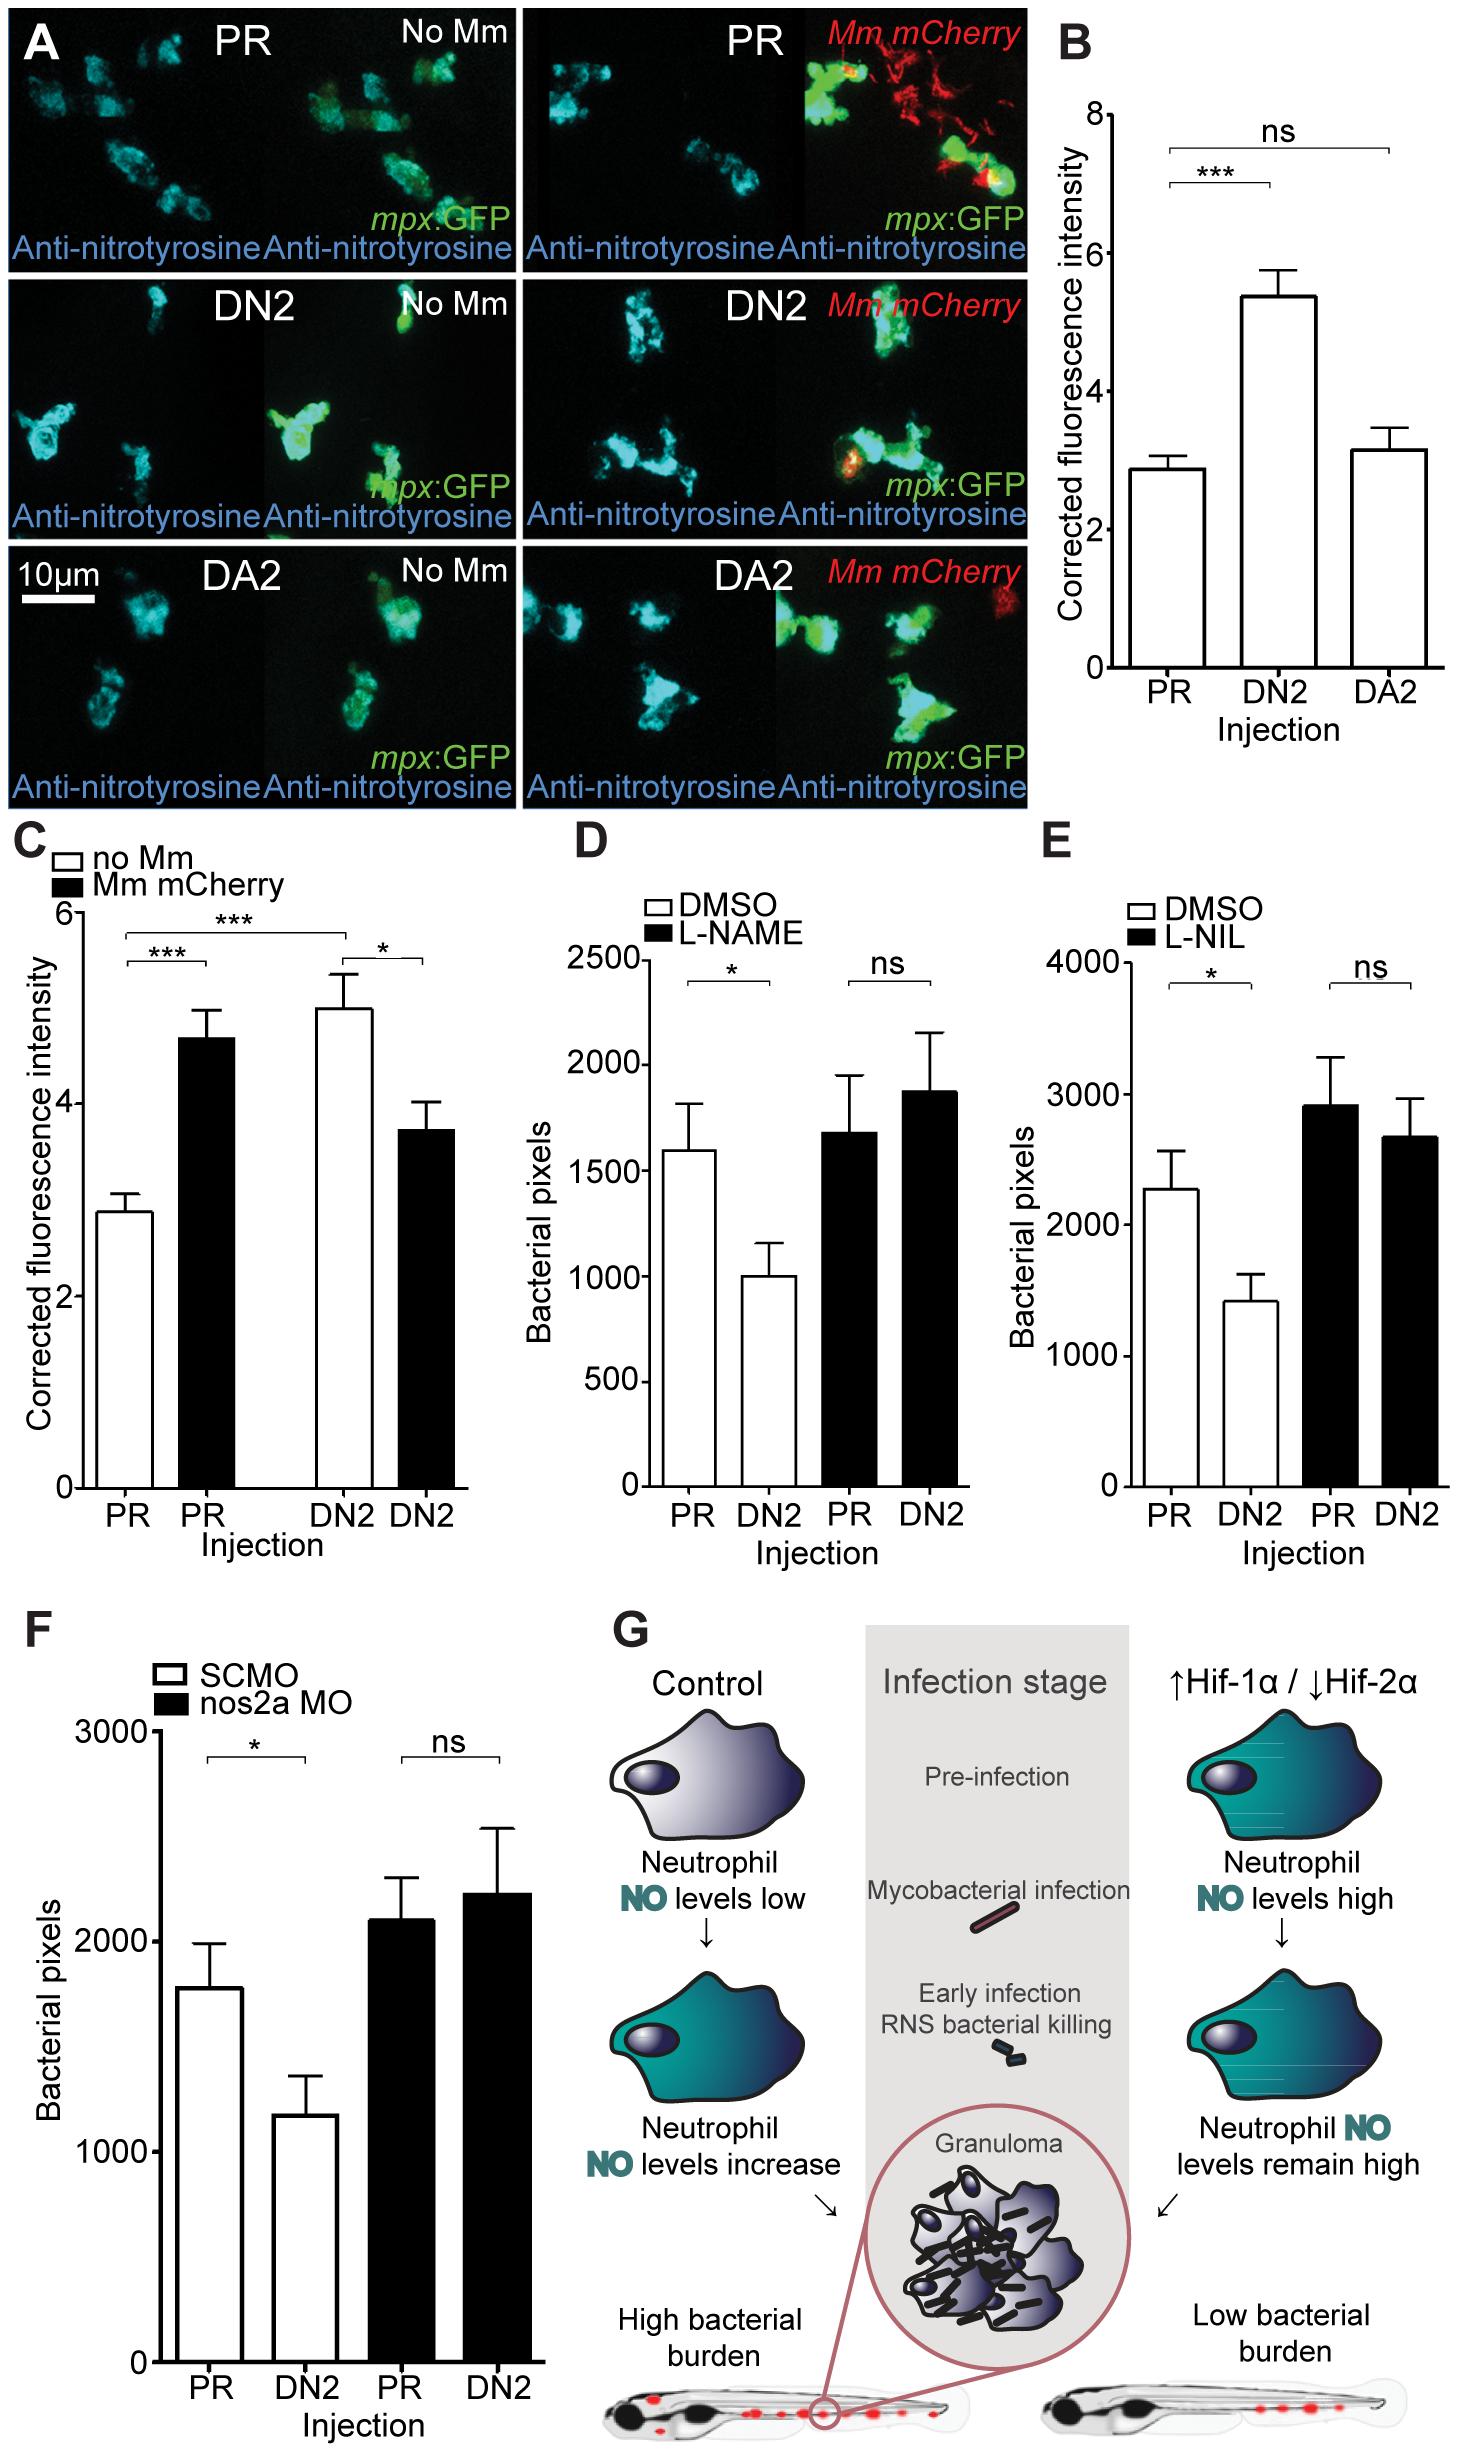 Dominant negative Hif-2α decreases bacterial burden via an iNOS dependent mechanism.